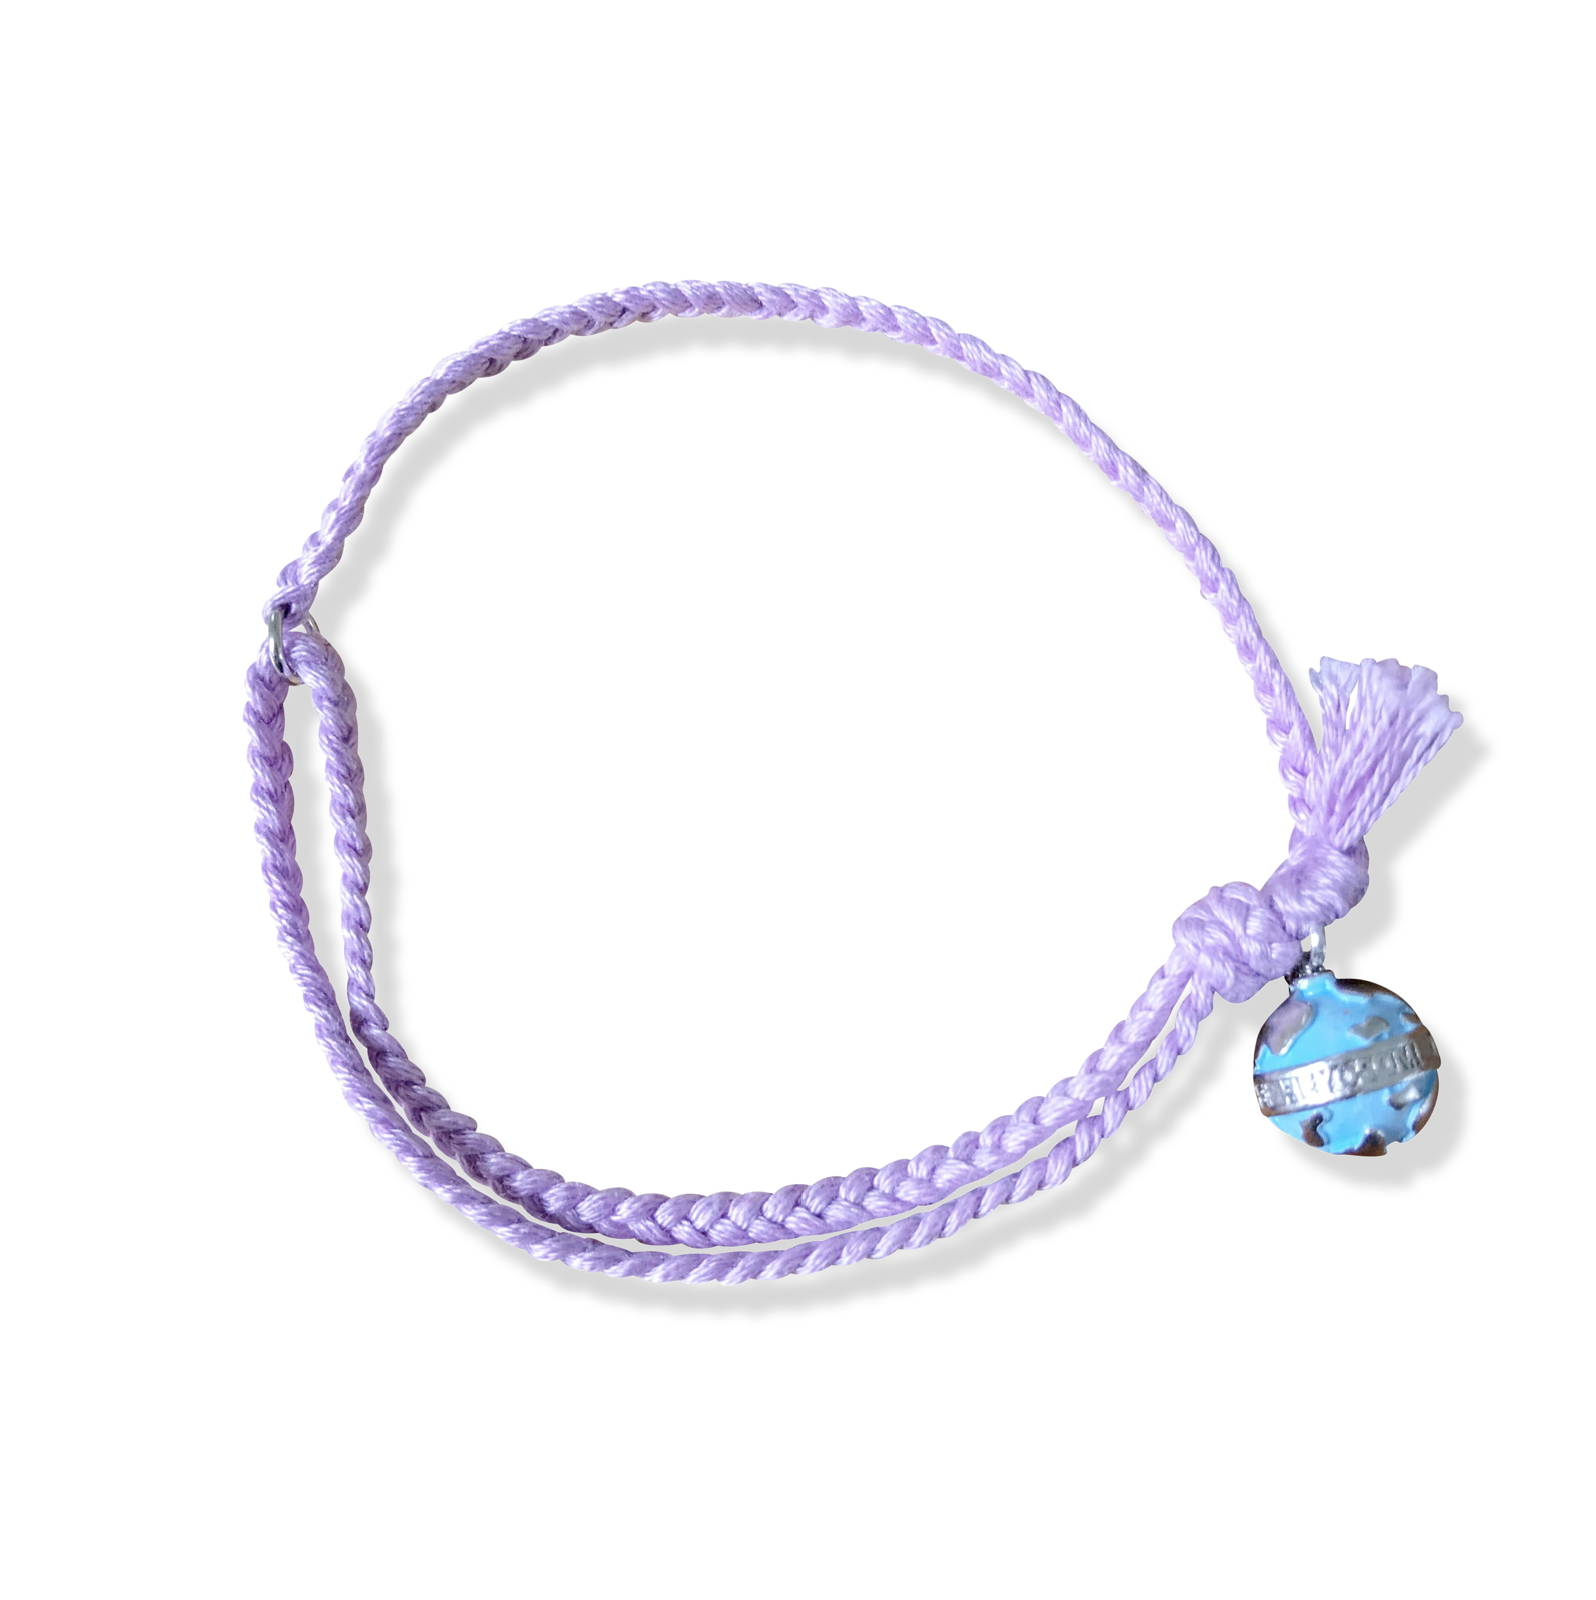 dog awareness bracelet, cat awareness bracelet, awareness bracelets, charity bracelets 2020, charity bracelets 2019, charity bracelets 2019, charity bracelets 2019, charity bracelets 2019